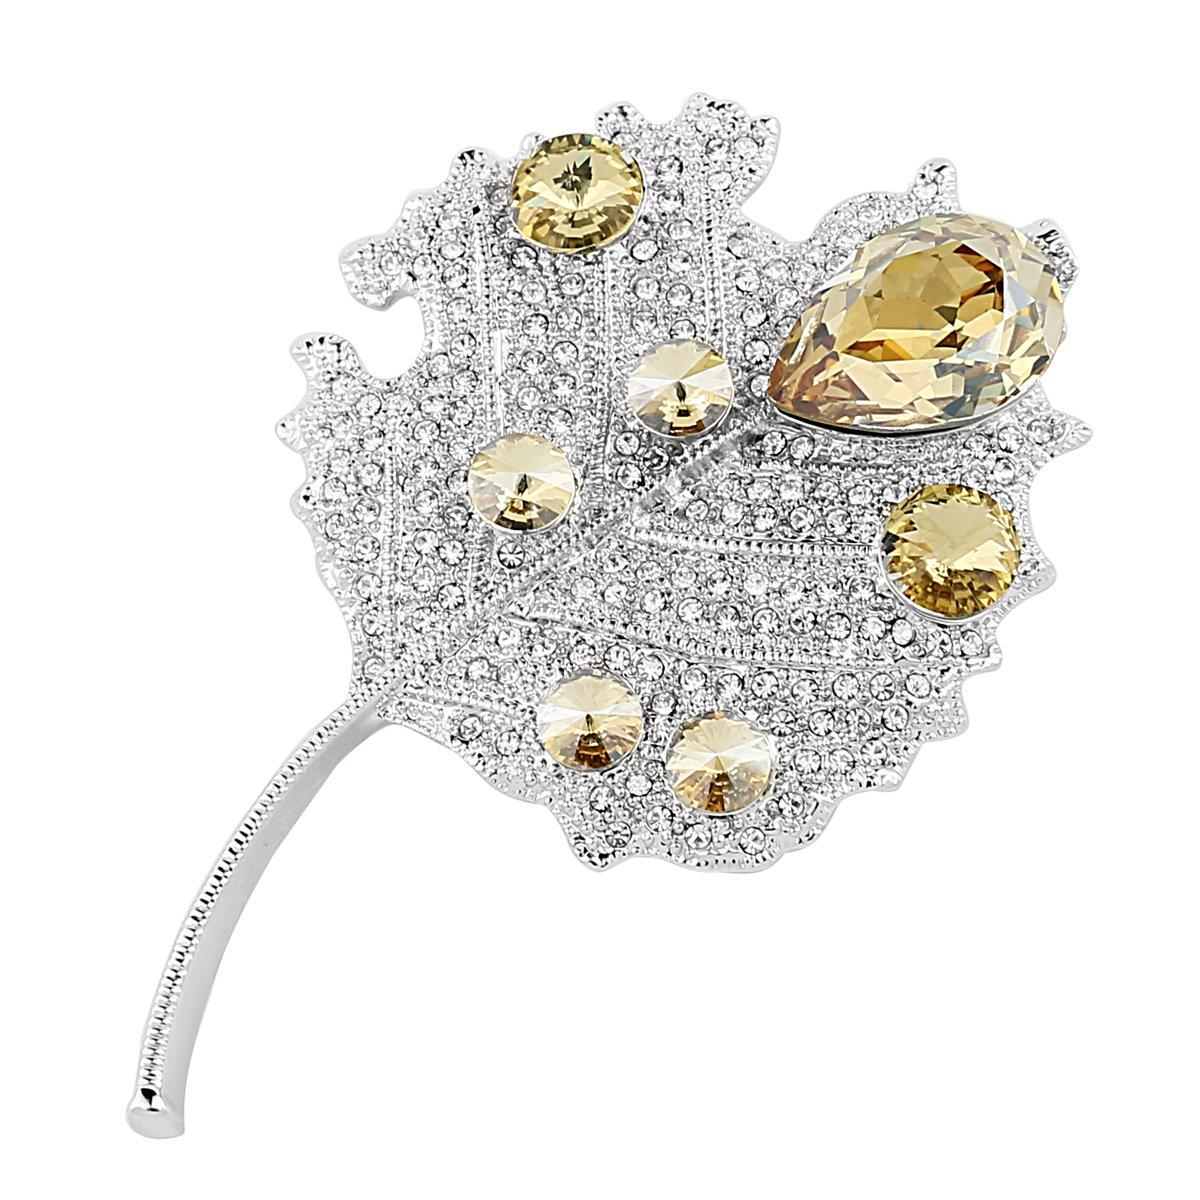 Womens Girls Rhinestone Crystal Maple Leaf Brooch Pins Valentine's Day Gifts